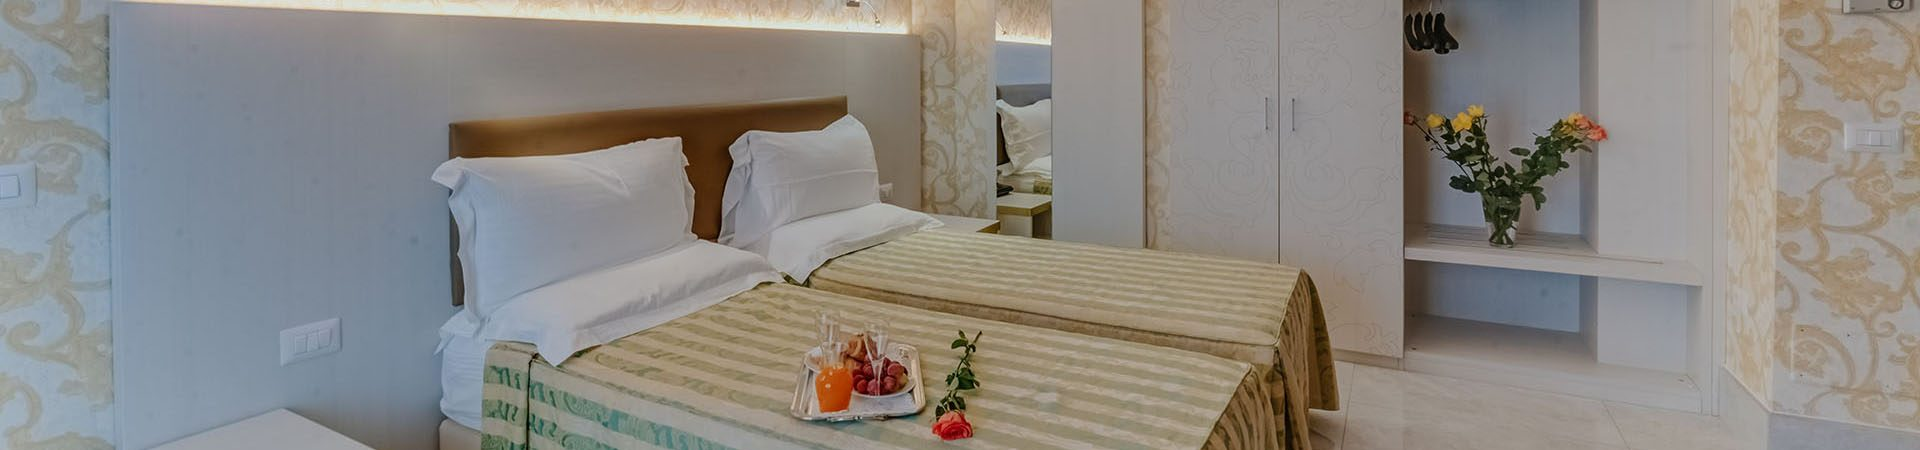 camere singole hotel flora